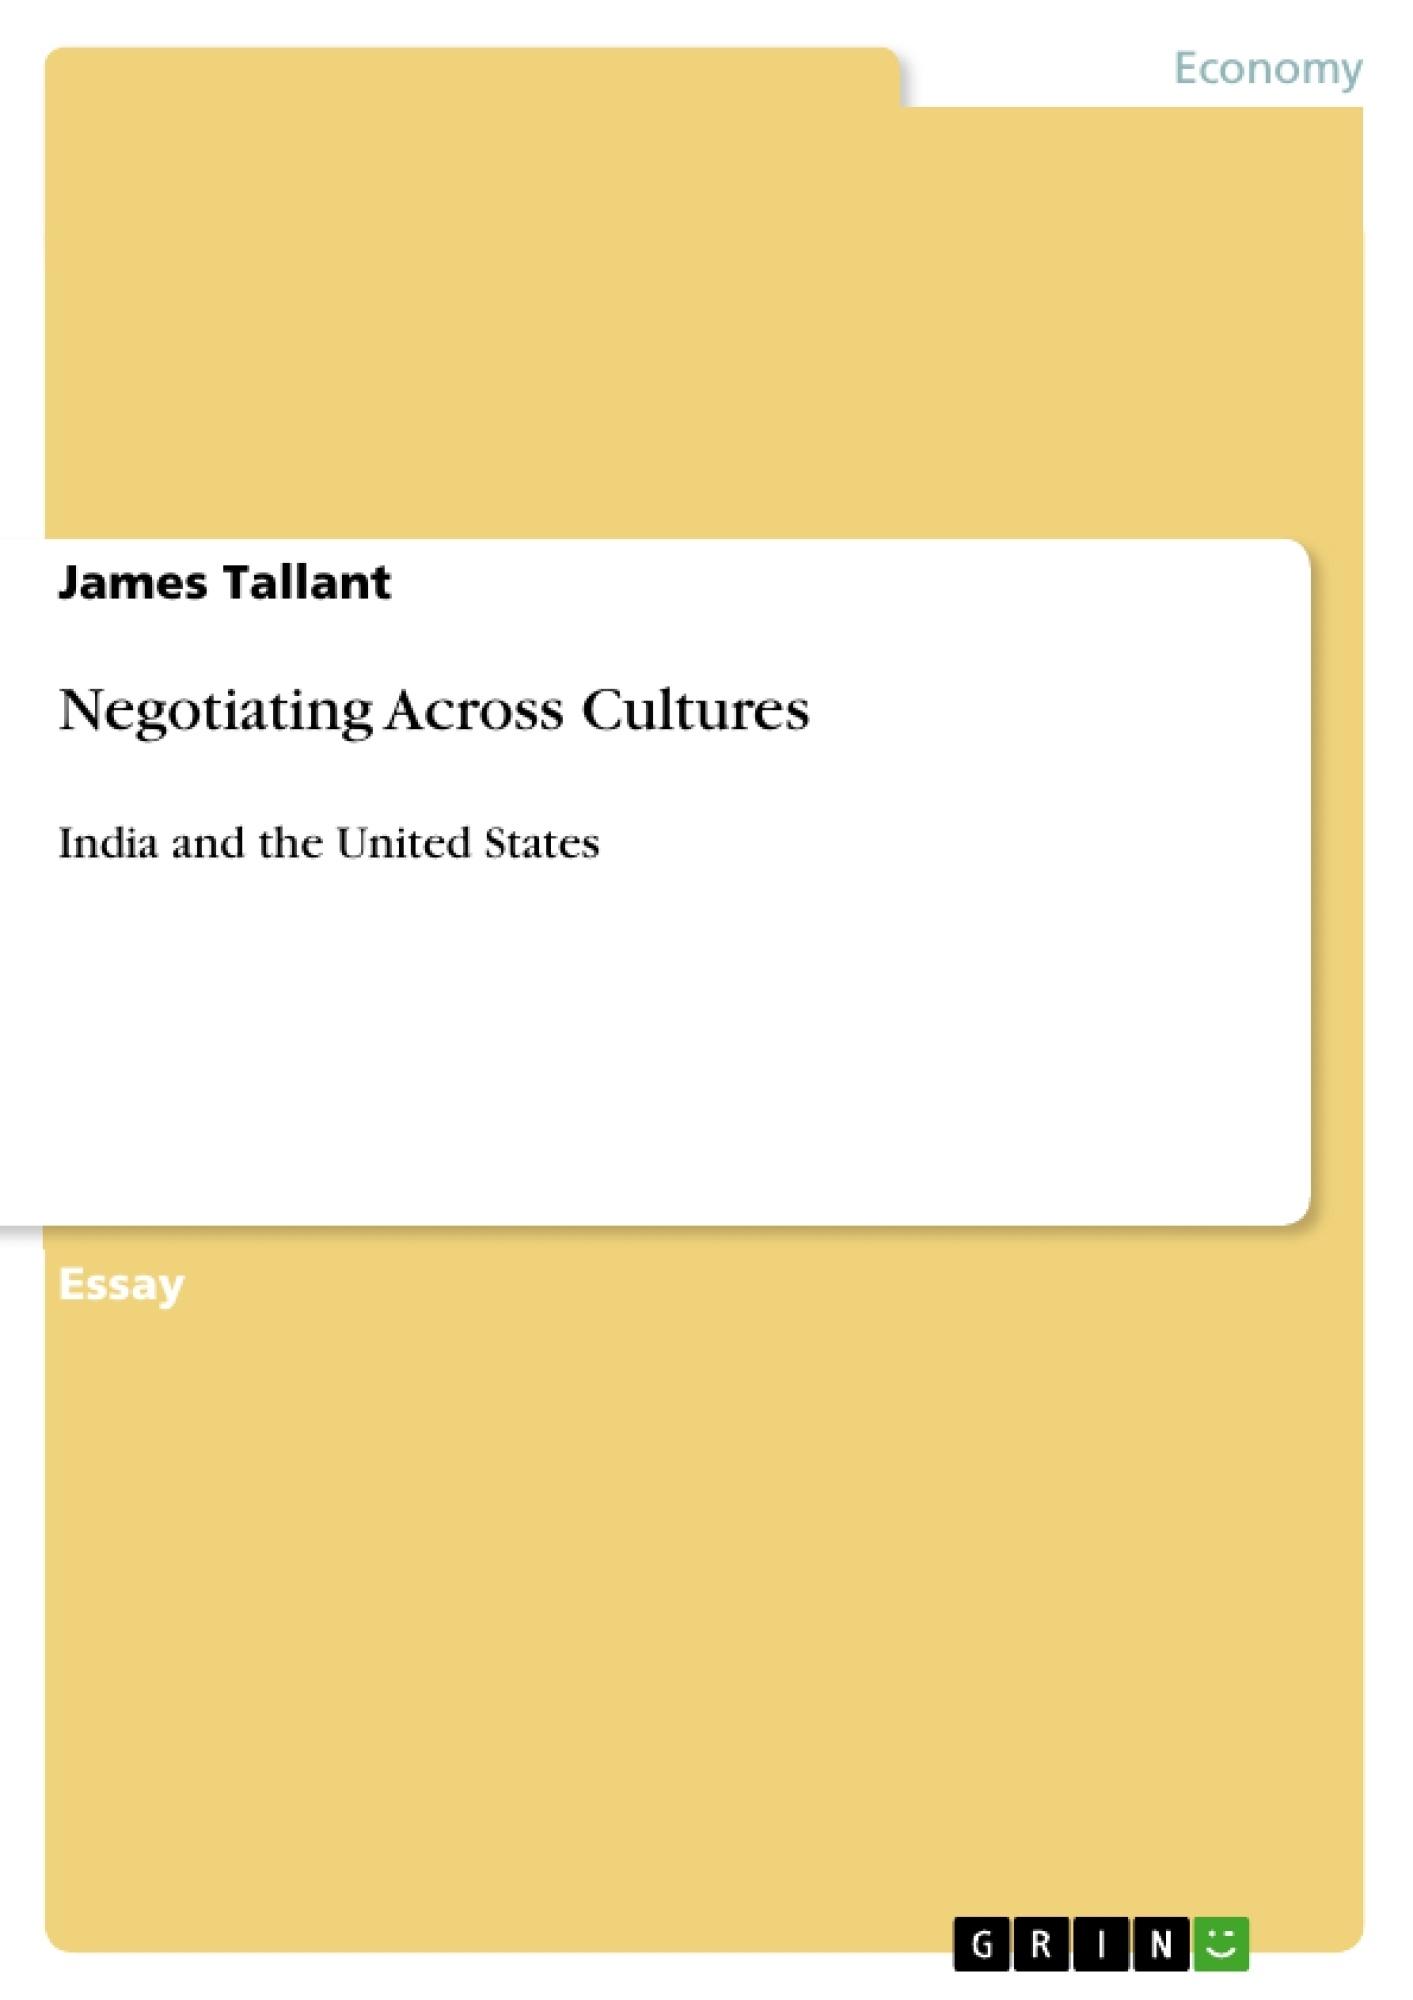 Title: Negotiating Across Cultures